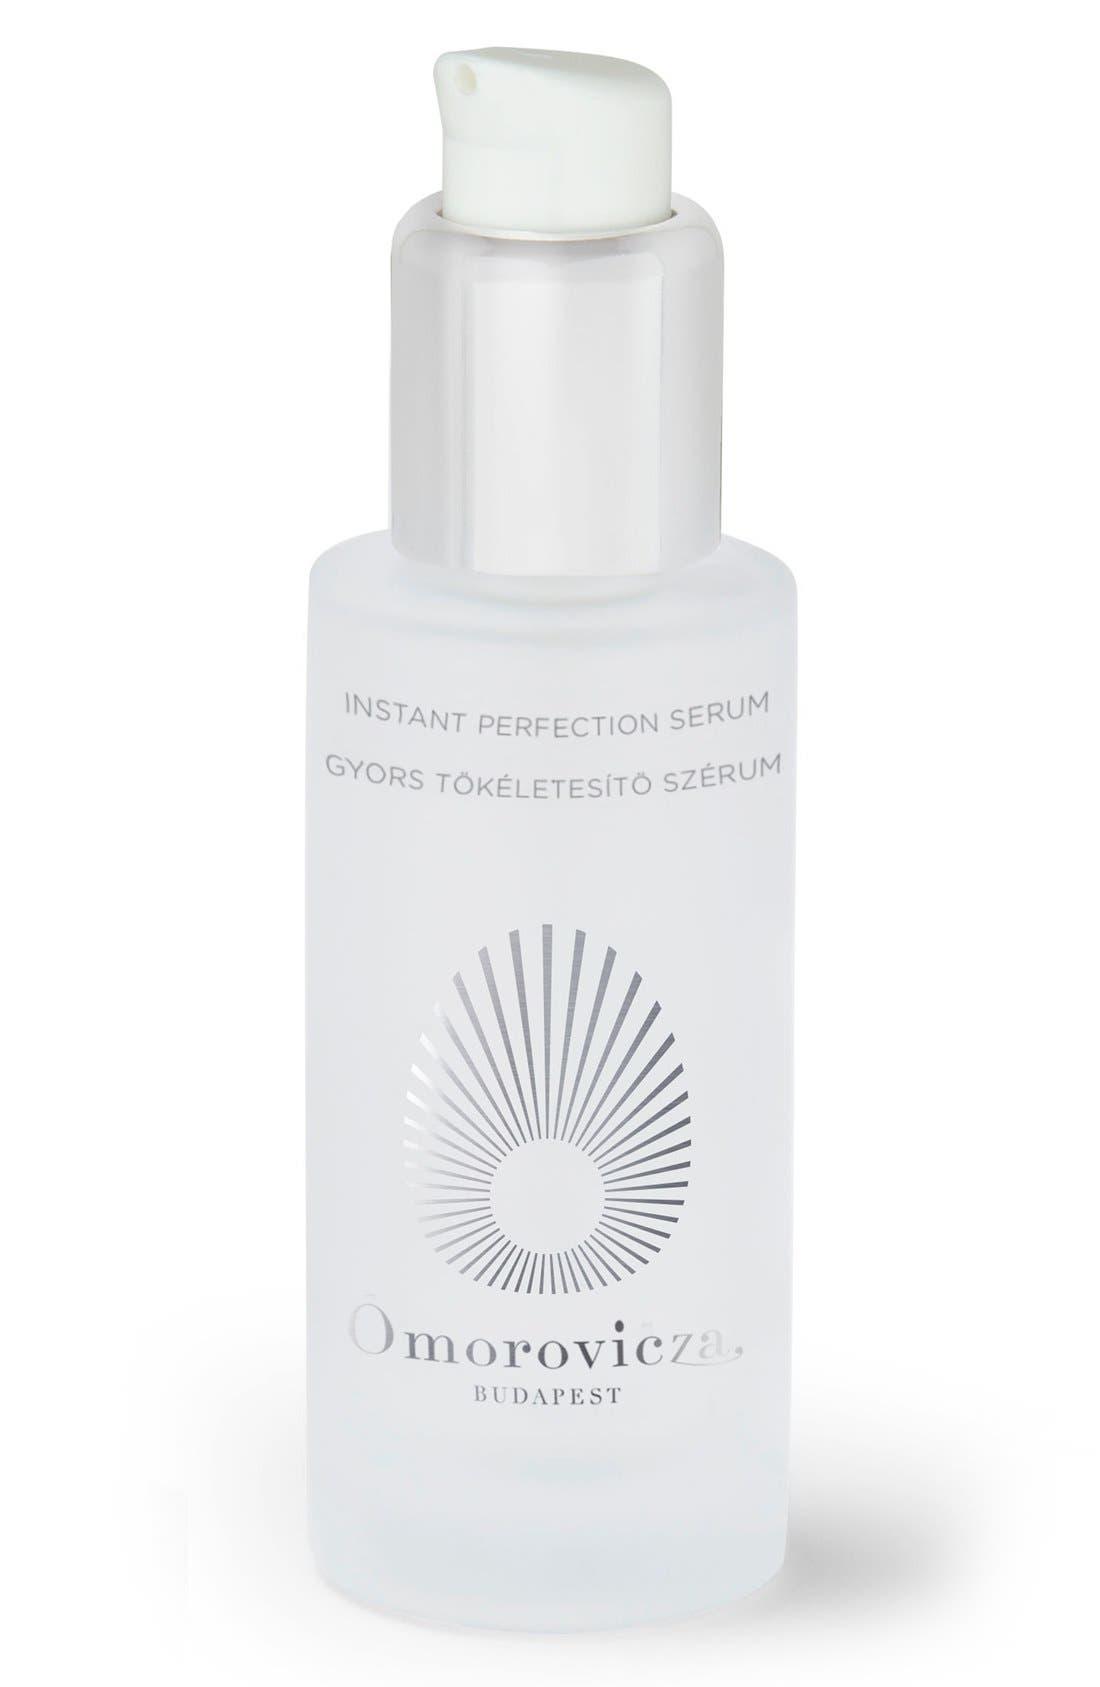 Omorovicza 'Instant Perfection' Serum